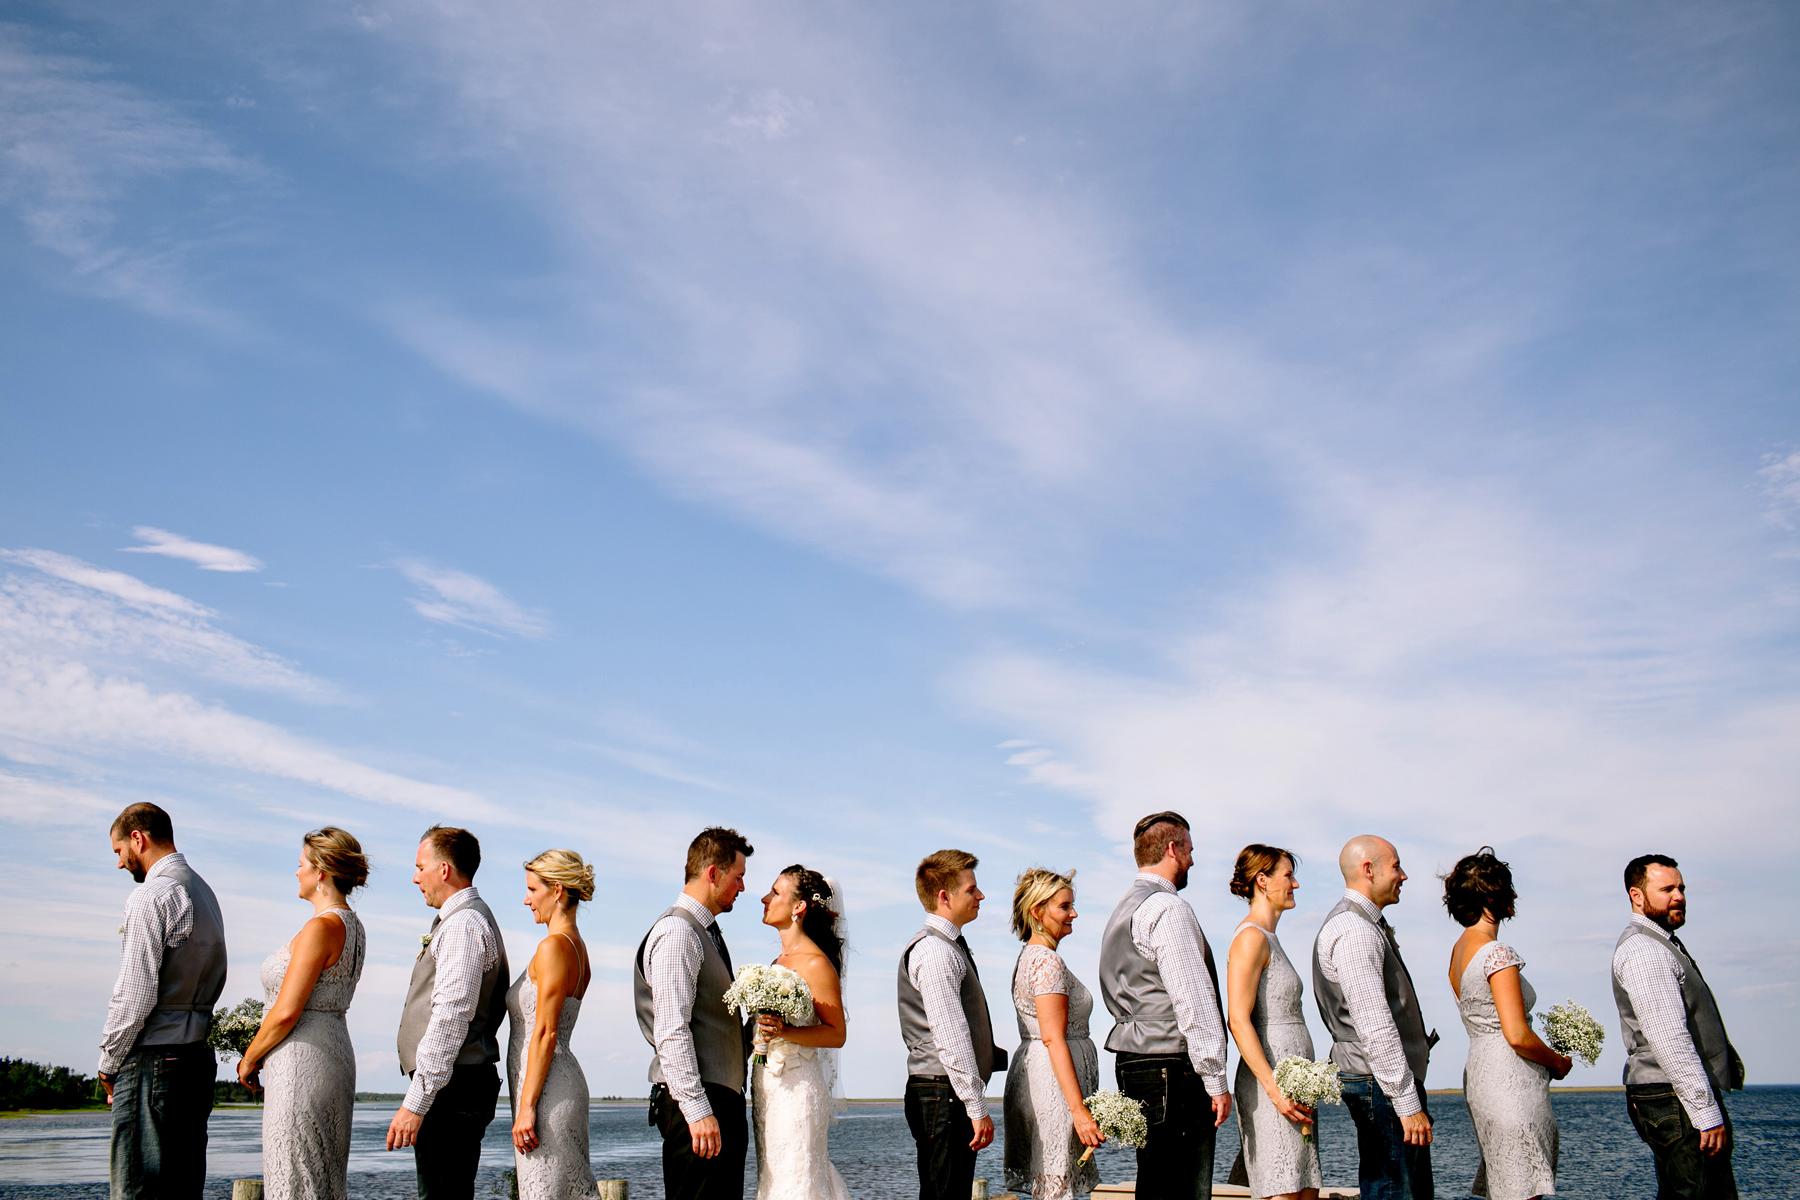 034-awesome-pei-wedding-photography-kandisebrown